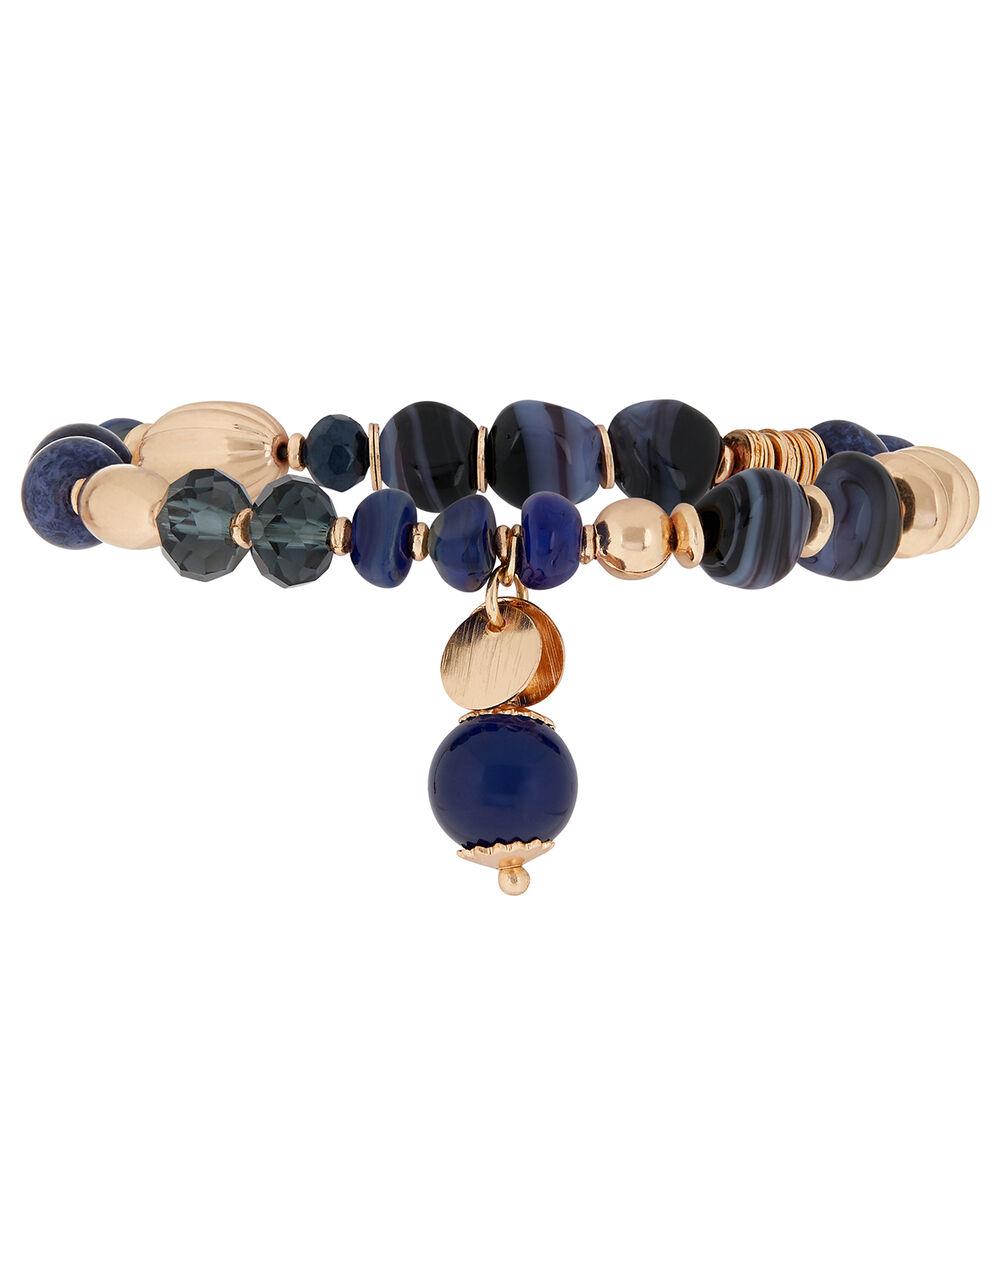 Stone Bead Stretch Bracelet, , large